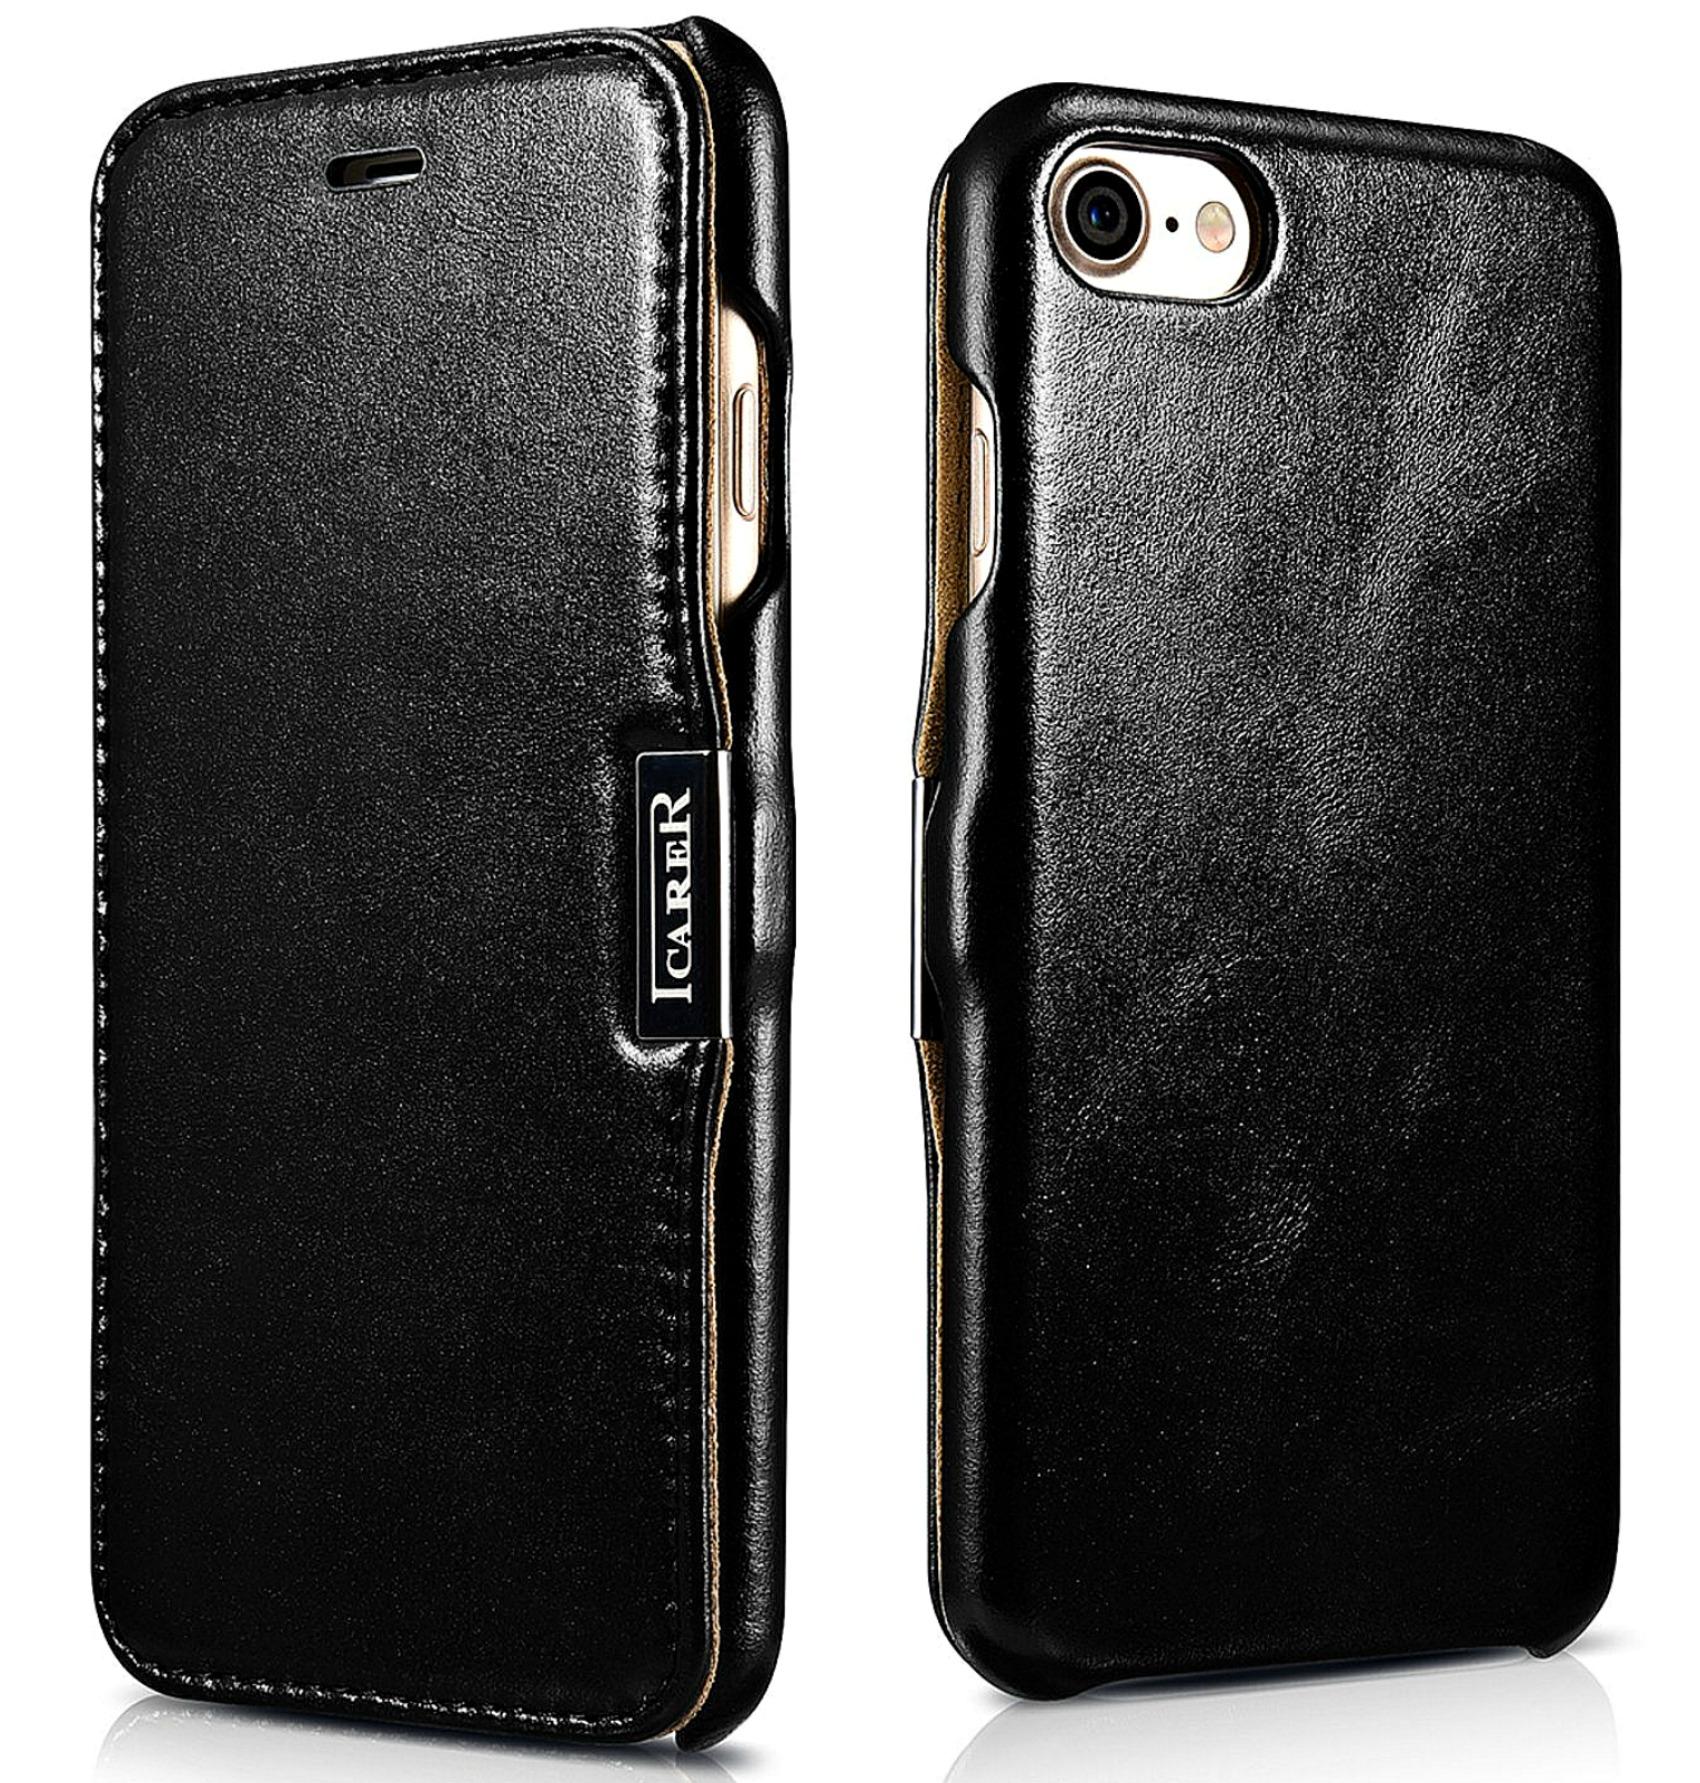 iCarer Vintage Series Side-Open Δερμάτινη Θήκη iPhone 8 / 7 - Black (RIP702BL)